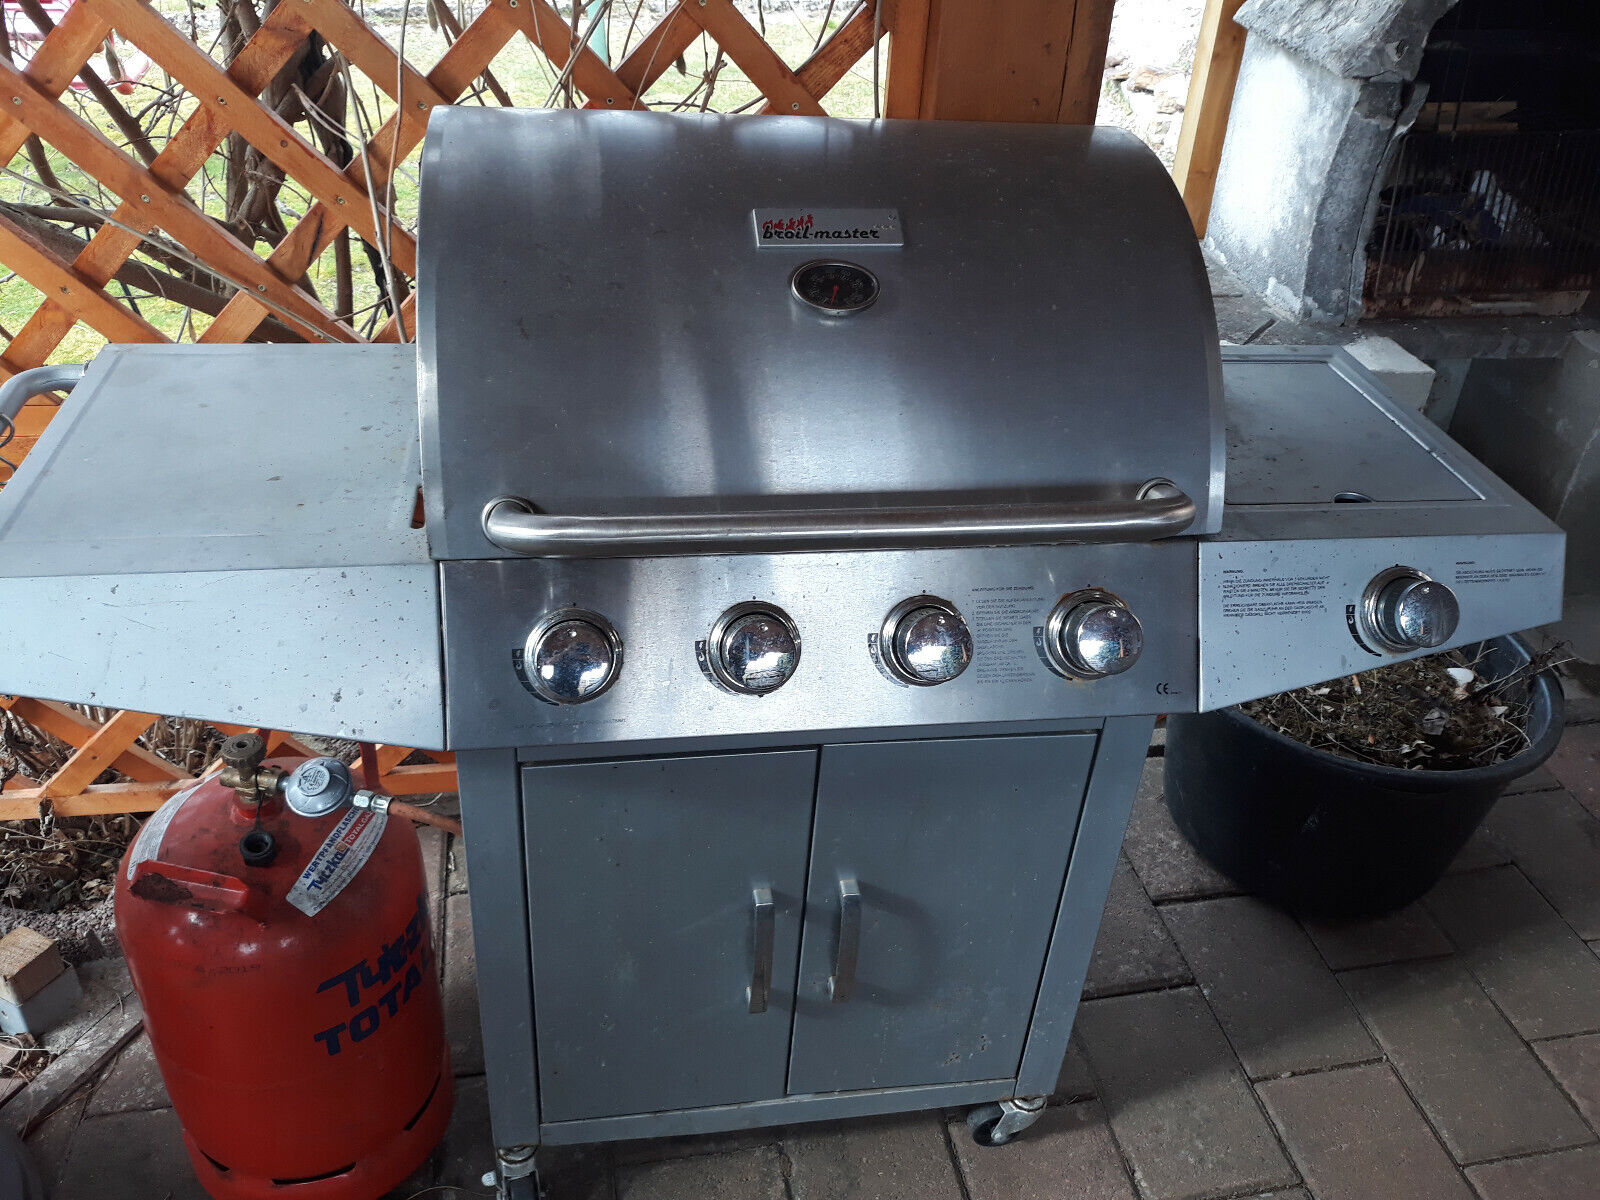 Profi Holzkohlegrill Test : Broil master grill test vergleich broil master grill günstig